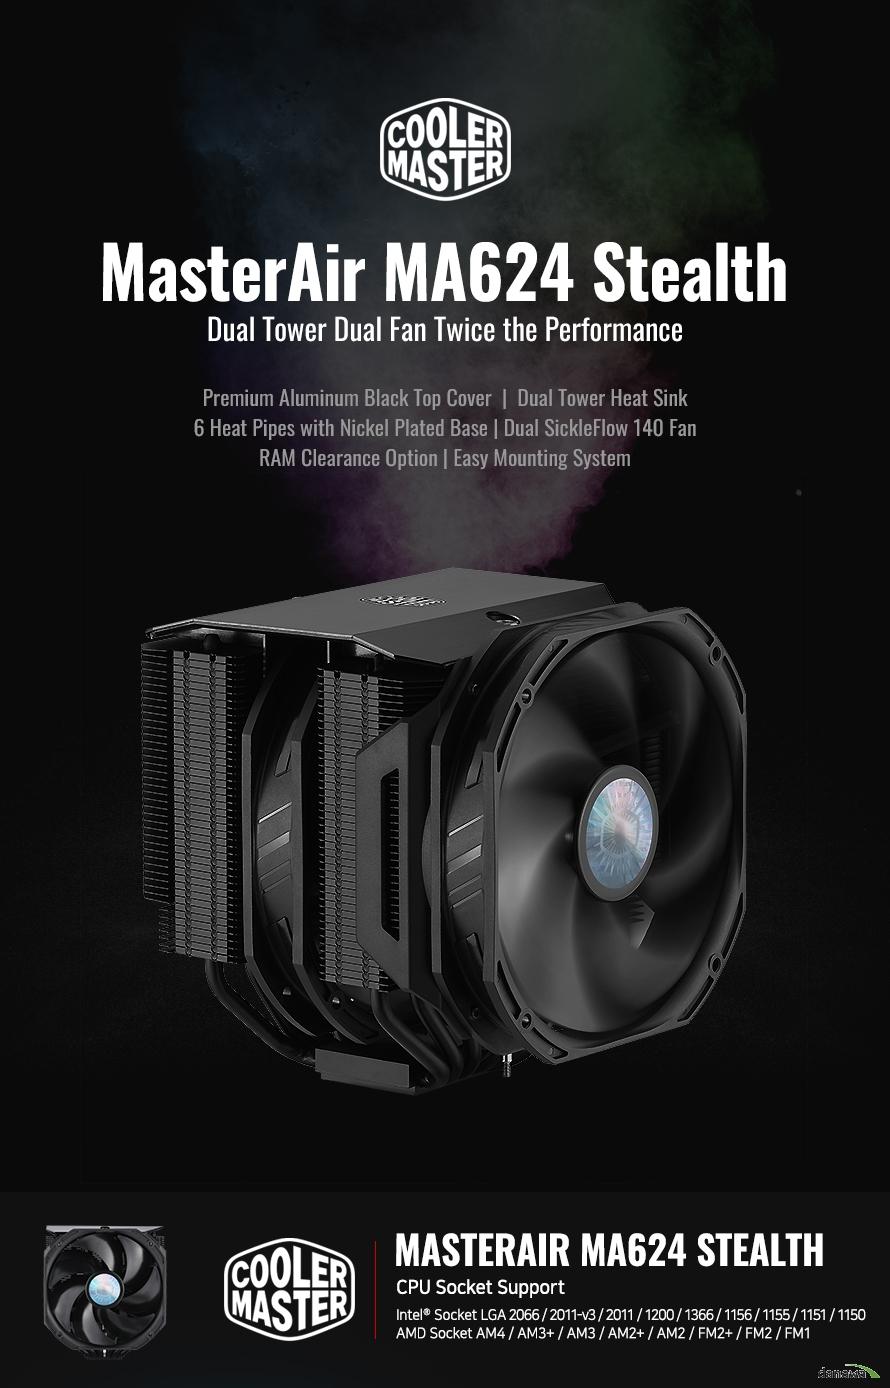 MasterAir MA624 Stealth Dual Tower Dual Fan Twice the Performance Premium Aluminum Black Top Cover  |  Dual Tower Heat Sink 6 Heat Pipes with Nickel Plated Base | Dual SickleFlow 140 Fan RAM Clearance Option | Easy Mounting System  MasterAir MA624 Stealth CPU Socket Support Intel® Socket LGA 2066 / 2011-v3 / 2011 / 1200 / 1366 / 1156 / 1155 / 1151 / 1150 AMD Socket AM4 / AM3+ / AM3 / AM2+ / AM2 / FM2+ / FM2 / FM1  인텔® 10세대 및 AMD4세대 라이젠TM, 최신 프로세서를 완벽하게 호환합니다. MasterAir MA624 Stealth는 INTEL LGA2066 소켓과 AMD AM4 소켓을 모두 지원합니다.  Dual FAN,  optimizes airflow With SickleFlow 140 Fan 두 개의 곡선형 블레이드를 장착한 SicleFlow Fan는 공기의 흐름을 최적화하여 손 쉽게 냉각하여 열을 제거합니다.   Black Aluminum Top Cover With offers a premium Finish 쿨러마스터만의 프리미엄 블랙 알루미늄으로 제작된 커버는 세련된 디자인을 완성합니다.  Copper Heatpipe x6 6개의 히트파이프와 니켈 도금 된 구리베이스에 프리미엄 블랙 알루미늄 마감으로 더욱 빠르게 발열을 제거할 수 있습니다.  SickleFlow 140 Fans  140mm 쿨링팬은 높은 풍압, 낮은 소음, 긴 수명을 자랑하는 Cooler Master의 팬으로 뛰어난 성능을 갖추었습니다.  SILENT COOLING TECHNOLOGY 고성능 저소음 쿨링팬 적용 SickleFlow 140 쿨링팬은 소음을 획기적으로 감소시키는 IC기술이 적용된 사일런트 드라이버를 장착하여 낮은 소음 으로 최고의 쿨링 성능을 제공합니다. 헬리콥터에서 영감을 받은 팬 블레이드 형태는 최고의 성능을 자랑합니다.  프리미엄 블랙 알루미늄 탑 커버 블랙 팬과 히트싱크가 매치된 블랙 알루미늄으로 제작된 커버는 세련된 디자인을 완성합니다.  이중으로 제작 된 히트싱크이중으로 제작된 히트싱크로 두배 더 나은 냉각 효과를 제공합니다.  니켈 도금 베이스의 6개의 히트 파이프6개의 히트파이프와 니켈 도금으로 제작된 구리베이스는 최적의 냉각 성능을 제공합니다.  듀얼 SICKLE FLOW 140 팬SickleFlow 140 팬은 공기 흐름과 압력을 위해 Push-Pull 설정 활용이 가능합니다.  램 호환성 및 여유 공간램 간섭을 최소화 하기 위해 SickleFlow 120mm 쿨링 팬 교체가 가능합니다.  간편한 장착간편한 설치를 위해 일체형 장착 설계가 가능합니다.  COMPATIBILITY & CLEARANCE ATX and M-ATX platforms. ATX 및 M-ATX 플랫폼에서 그래픽 카드의 호환성을 위한 최적의 디자인을 완성합니다.   팬 구성 SickleFlow 120 x 1 및 SickleFlow 140 x 1 여유 공간 과 호환성을 위해 40mm RAM 높이를 허용합니다.  SickleFlow 140 x1 SickleFlow 140의 히트싱크 설계는 최대 70mm 의 RAM 호환성을 제공합니다.    OPTIONAL PUSH-PULL FAN CONFIGURATION 추가적인 120mm 쿨링팬 교체 가능 랩 간섭을 최소화하기 위해 140mm ▶ 120mm 쿨링팬으로 교체가 가능하여, 시스템 환경에 맞는 최적화된 쿨링 환경을 구축할 수 있습니다.   CPU SocketIntel® Socket LGA 2066 / 2011-v3 / 2011 / 1200 / 1366 / 1156 / 1155 / 1151 / 1150 AMD® Socket  AM4 / AM3+ / AM3 / AM2+ /